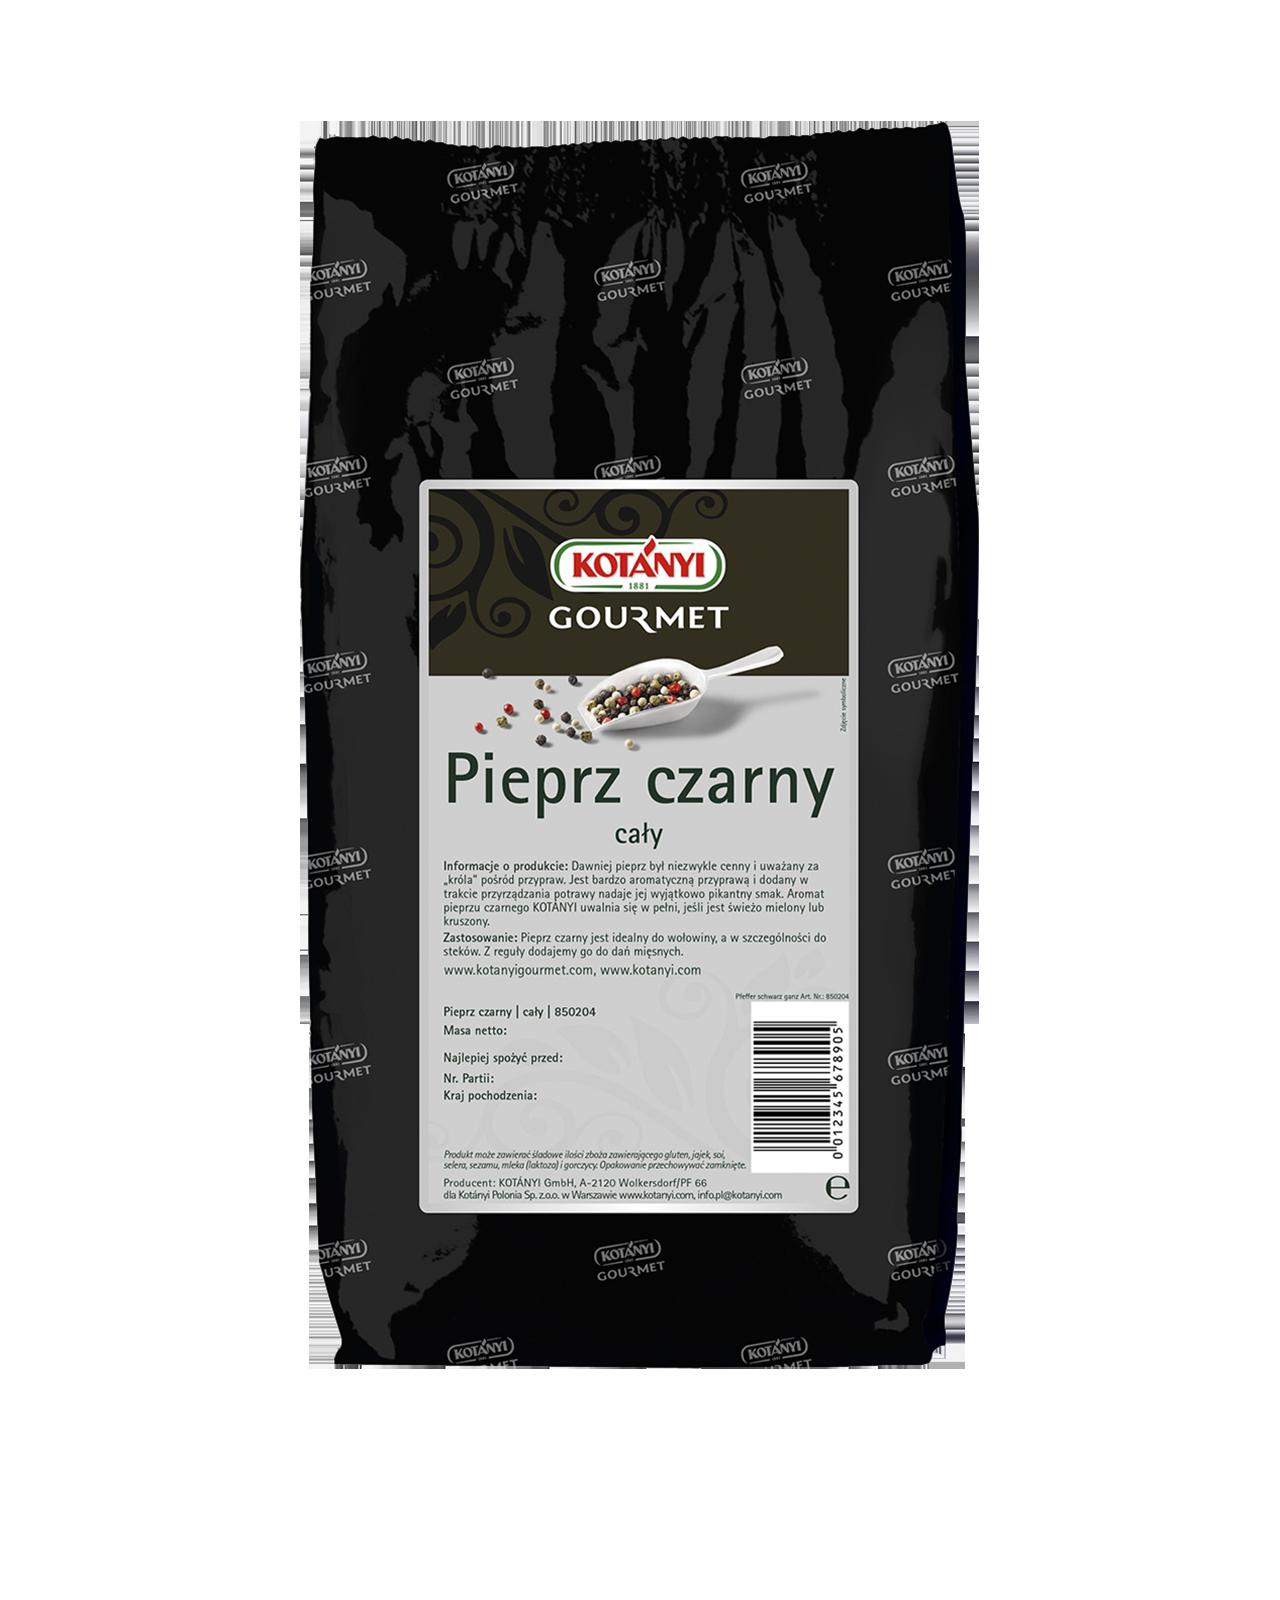 850204 Kotanyi Pieprz Czarny Caly B2b Bag 1000g